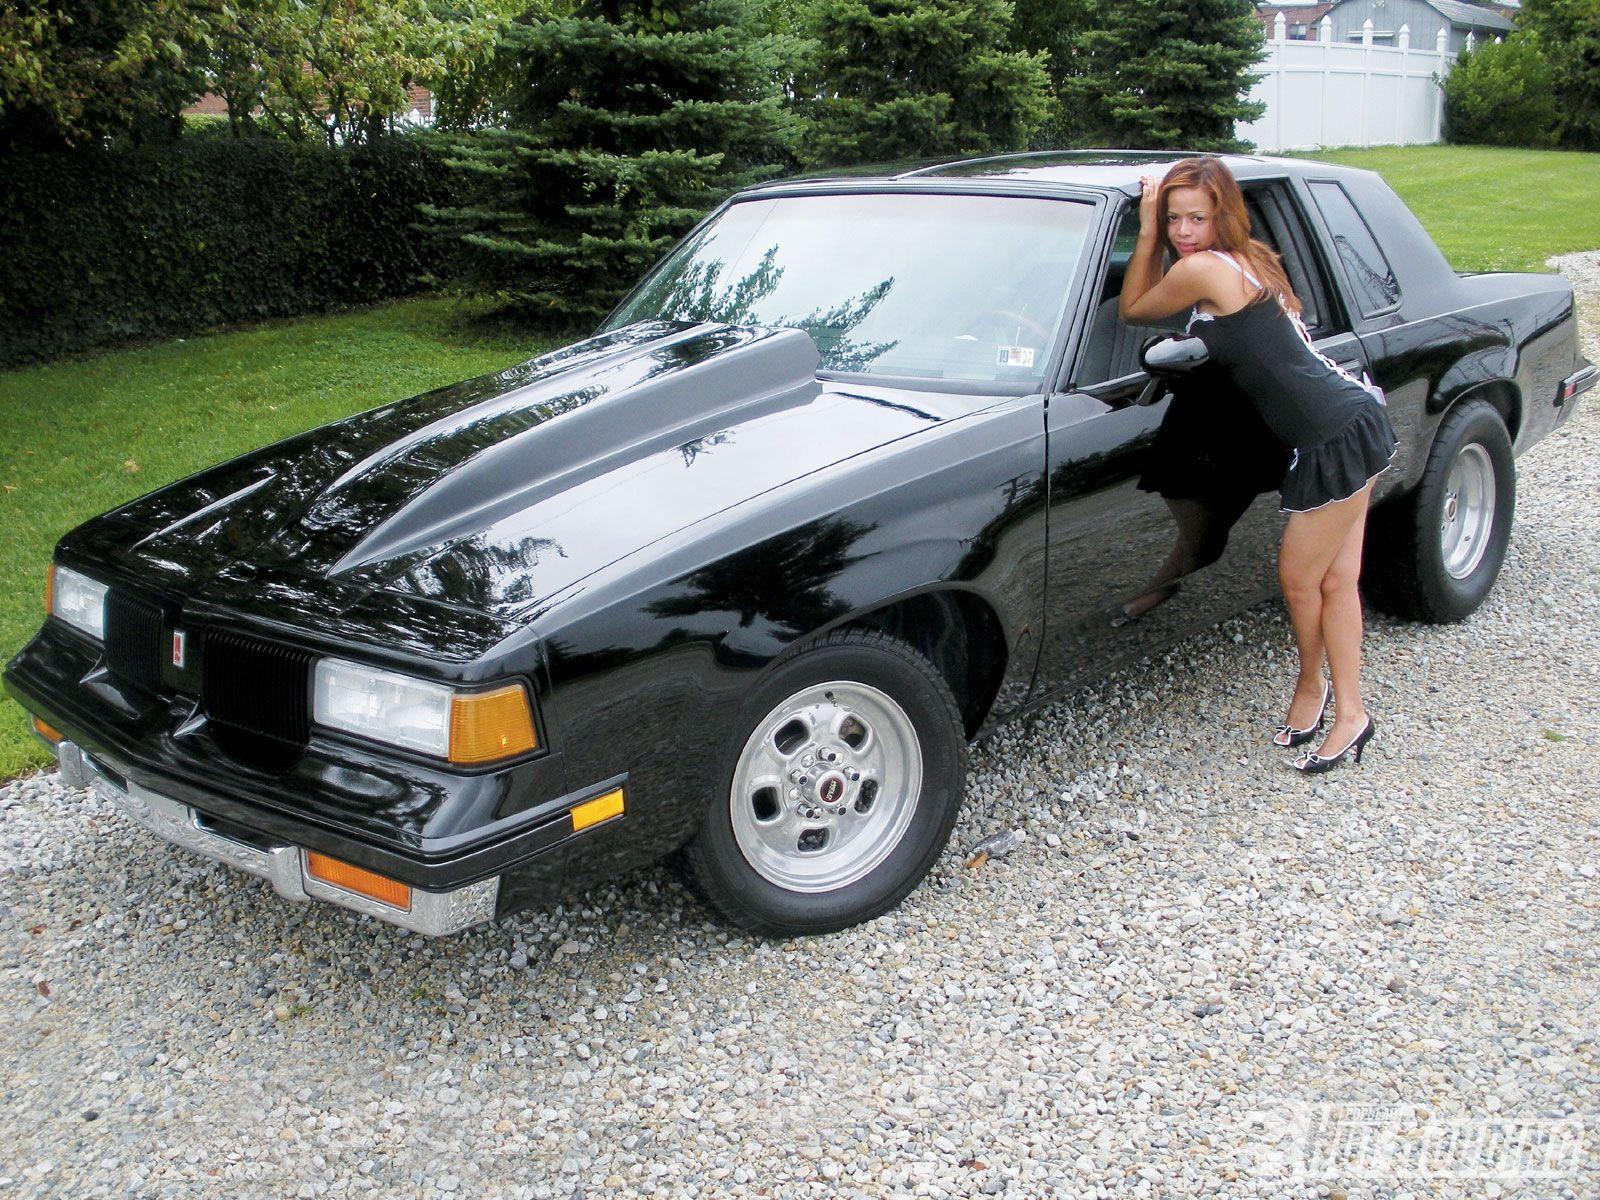 g body oldsmobile - Google Search | g bodys | Cars